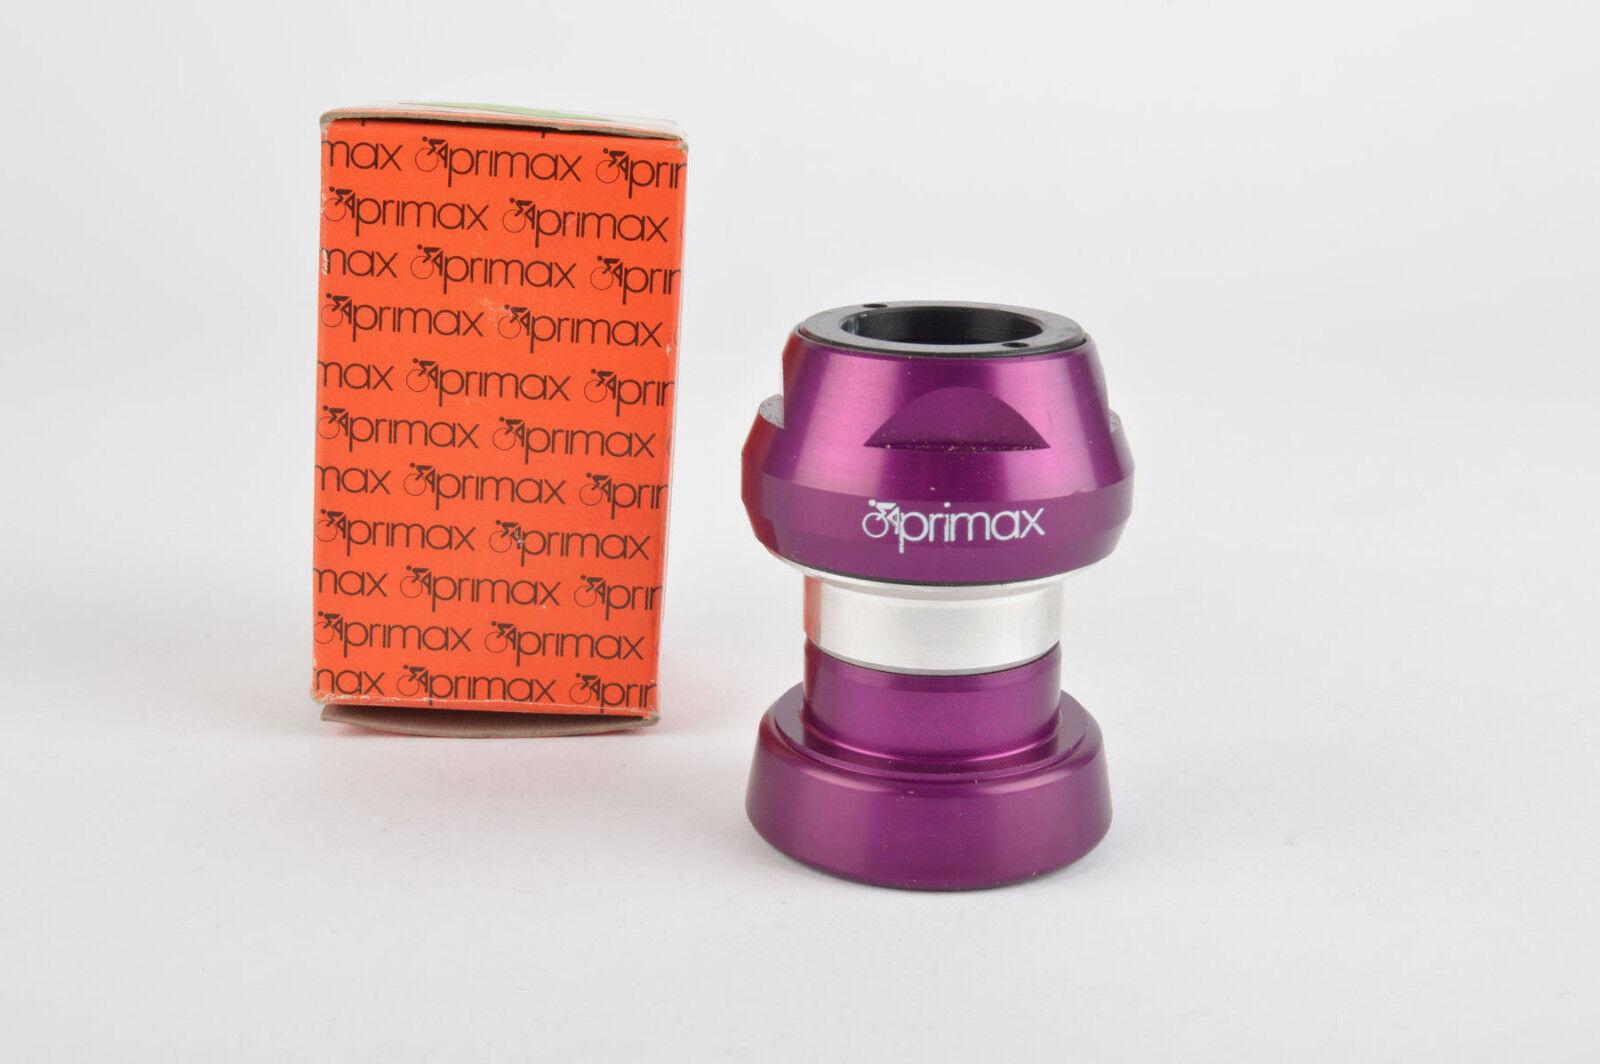 NEW Primax Misura purple anodized needle bearing Headset french threading NOSNIB